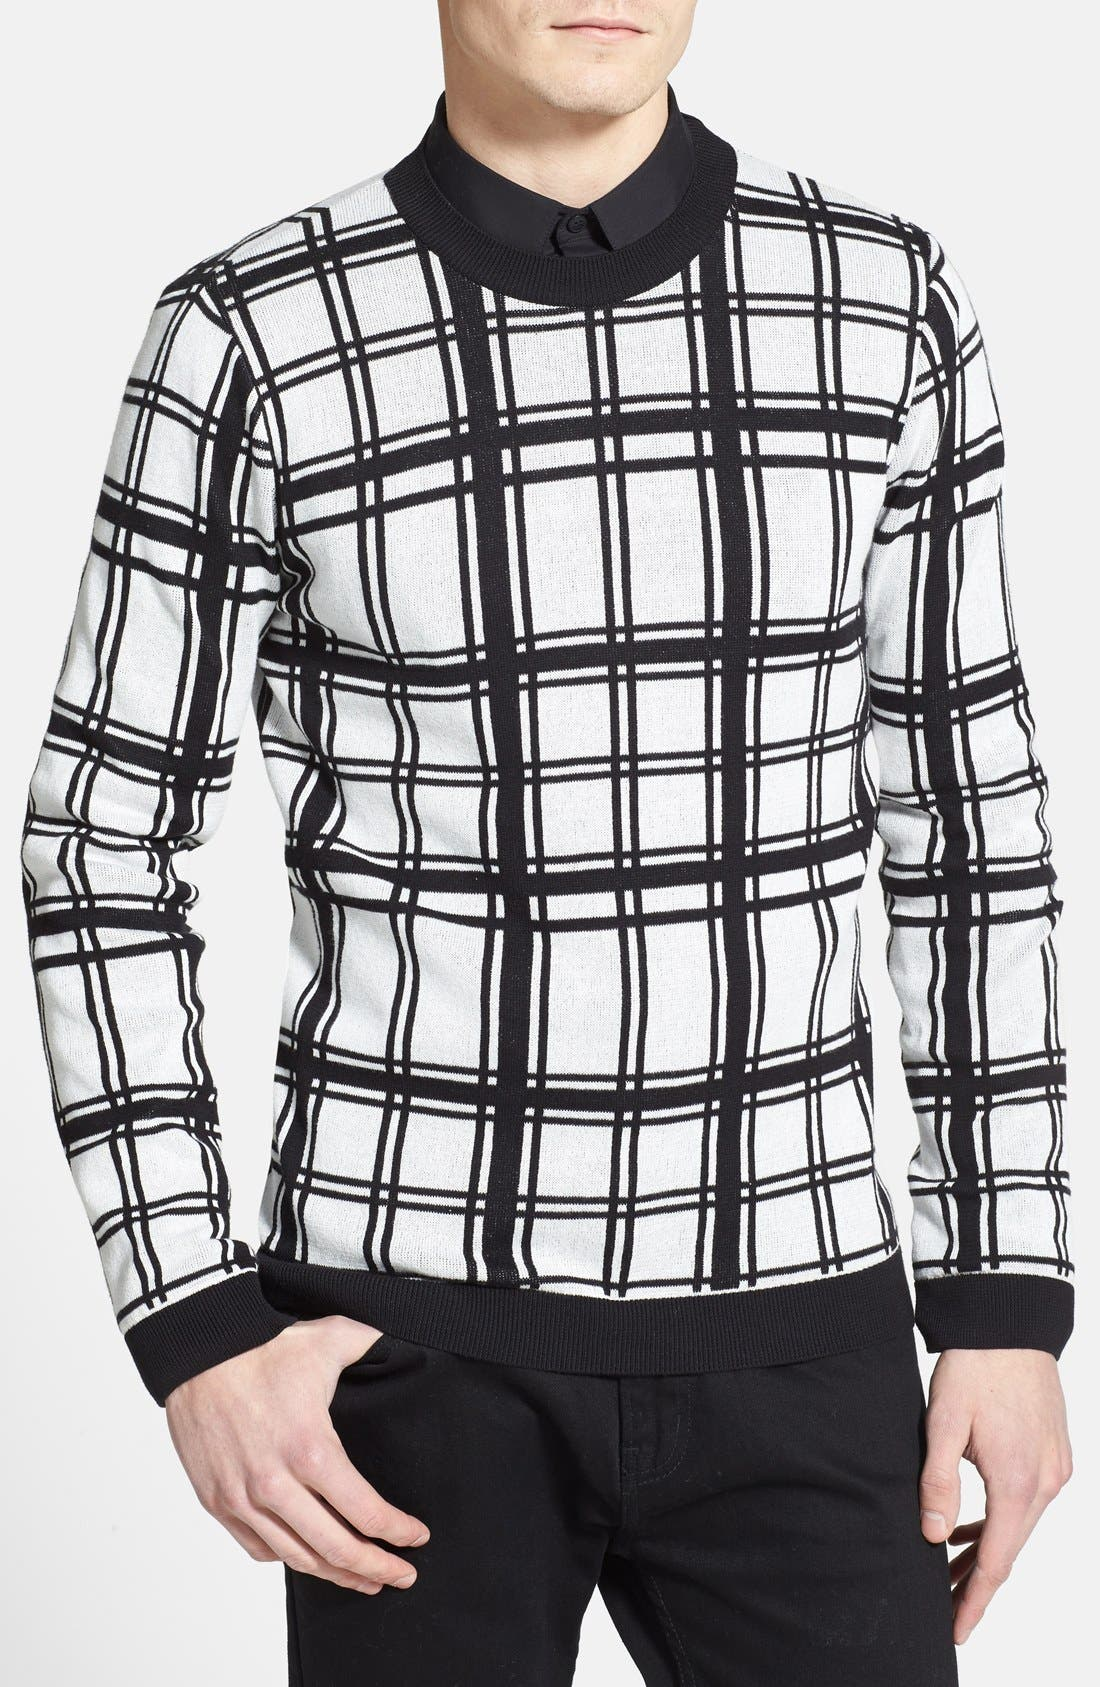 Alternate Image 1 Selected - Topman Check Crewneck Sweater